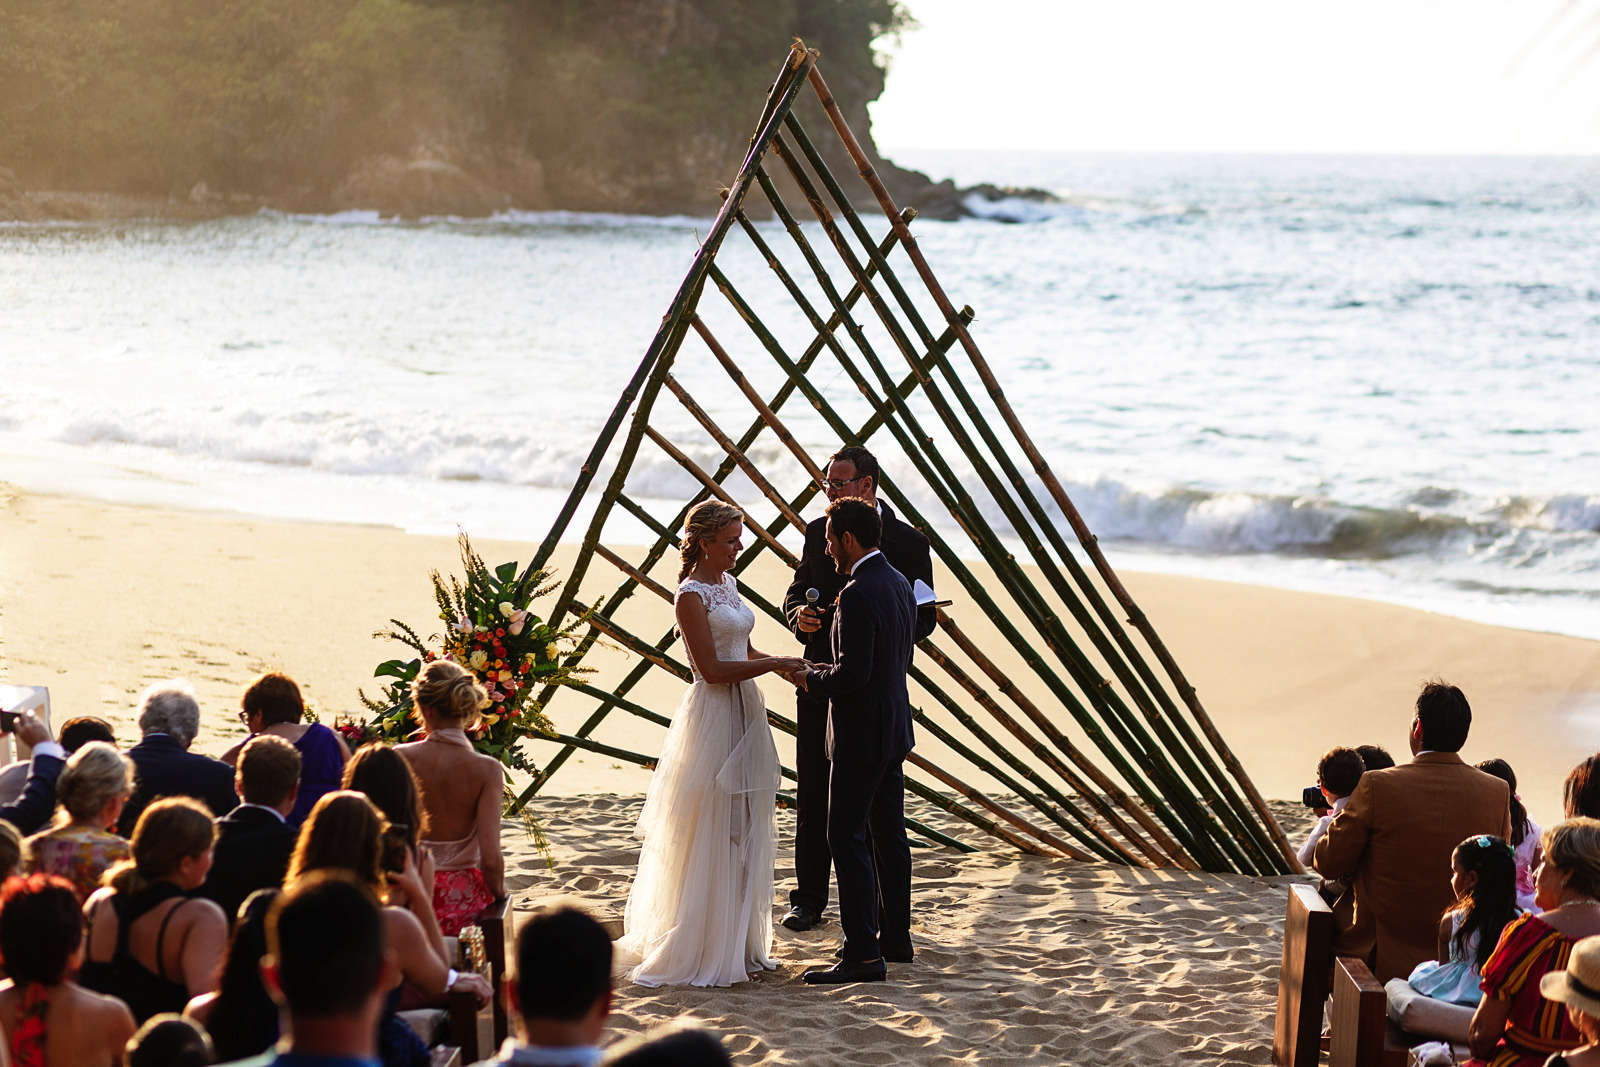 Wedding ceremony on the beach vows exchange in progress